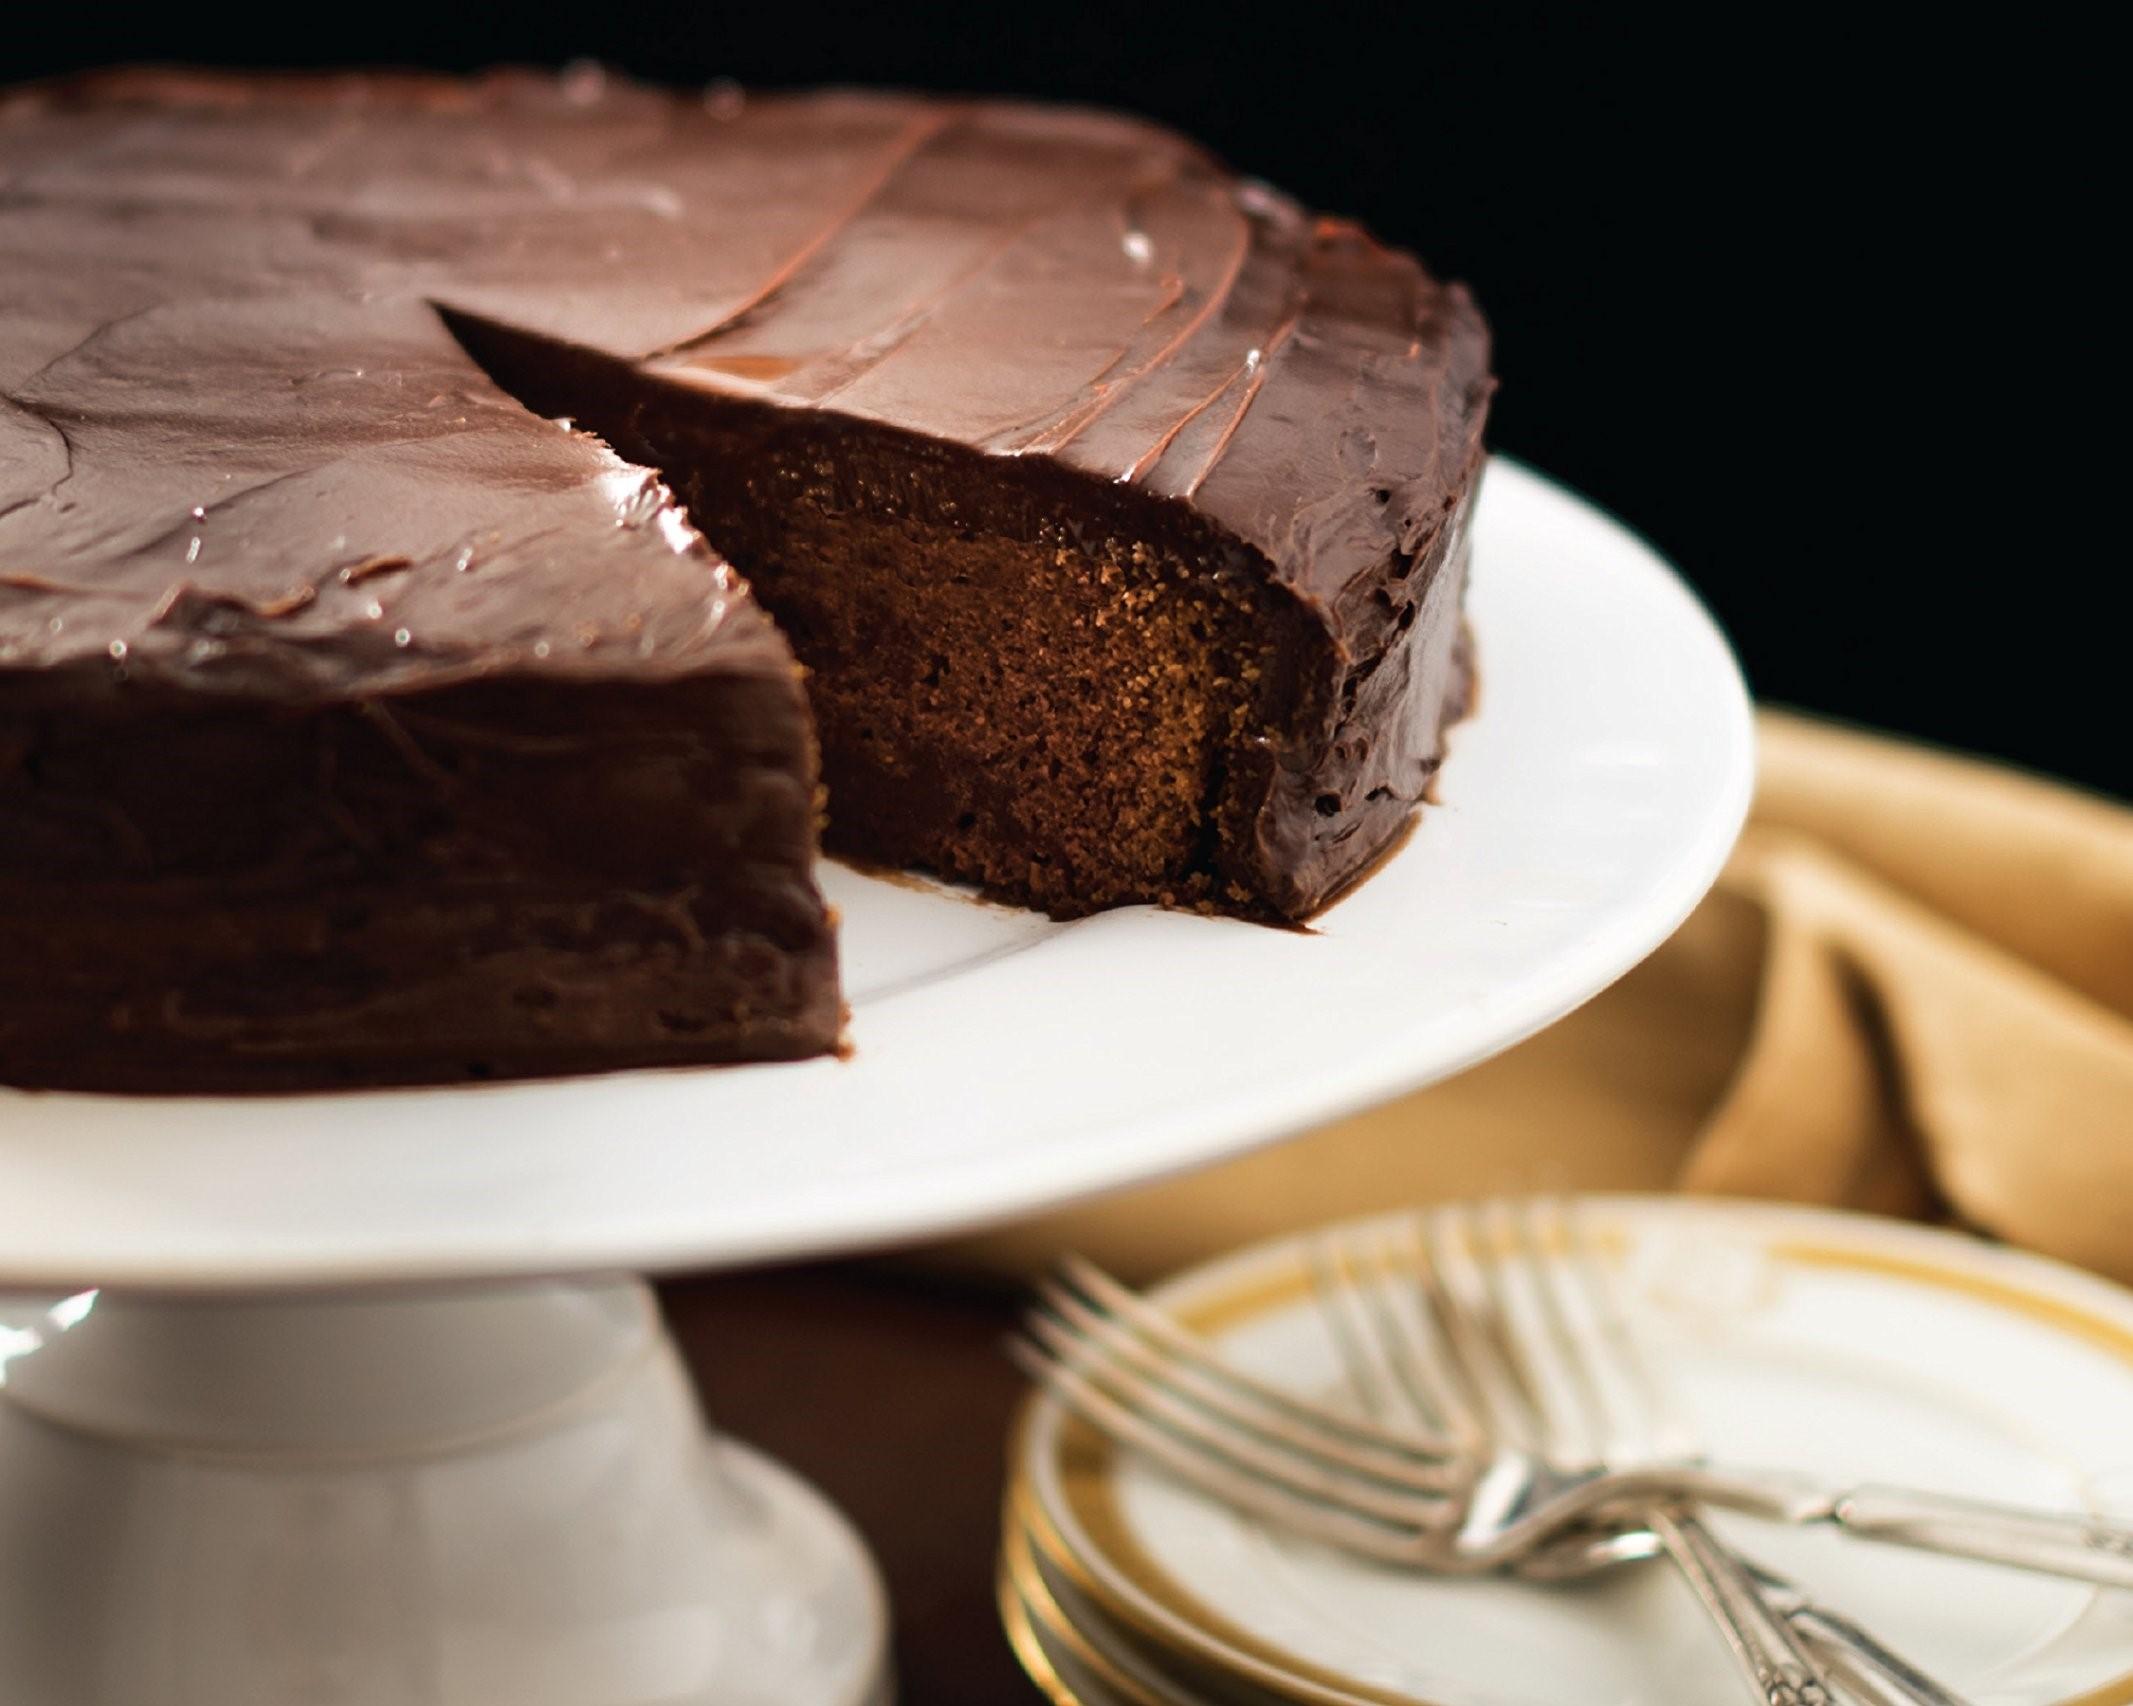 James Patterson's Grandma's Killer Chocolate Cake